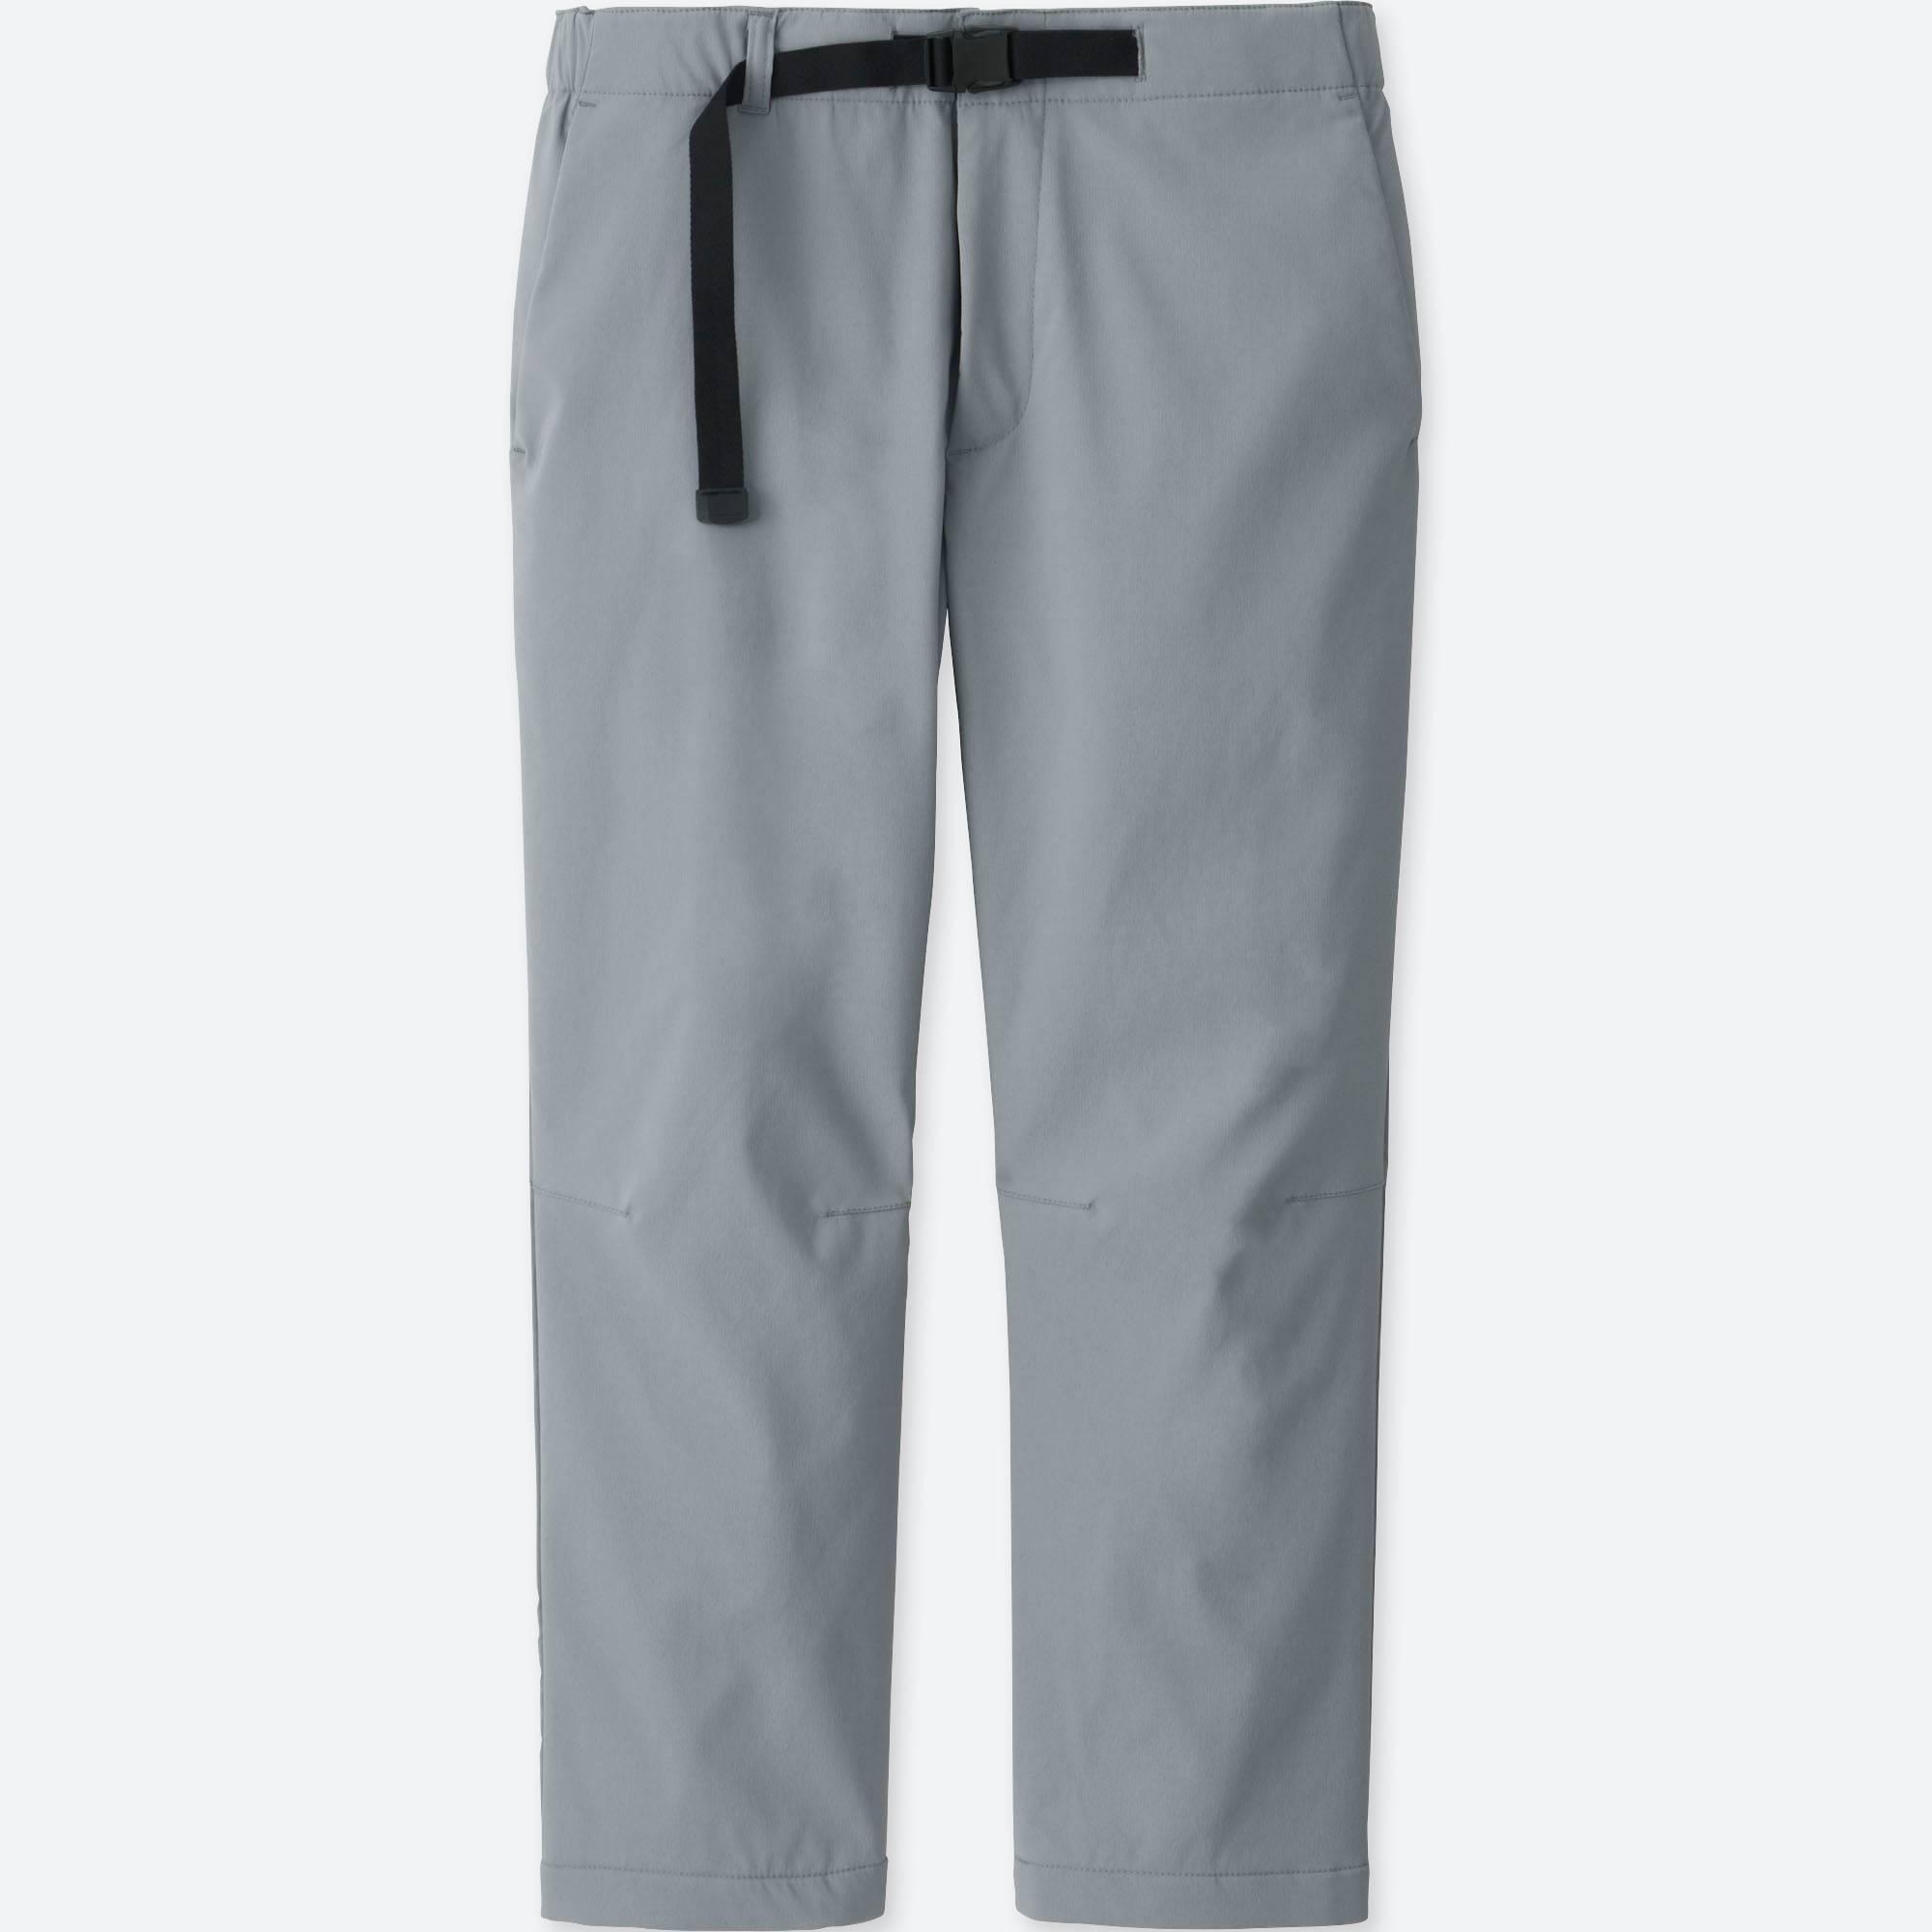 681f830a91939 MEN DRY CROPPED JOGGER PANTS